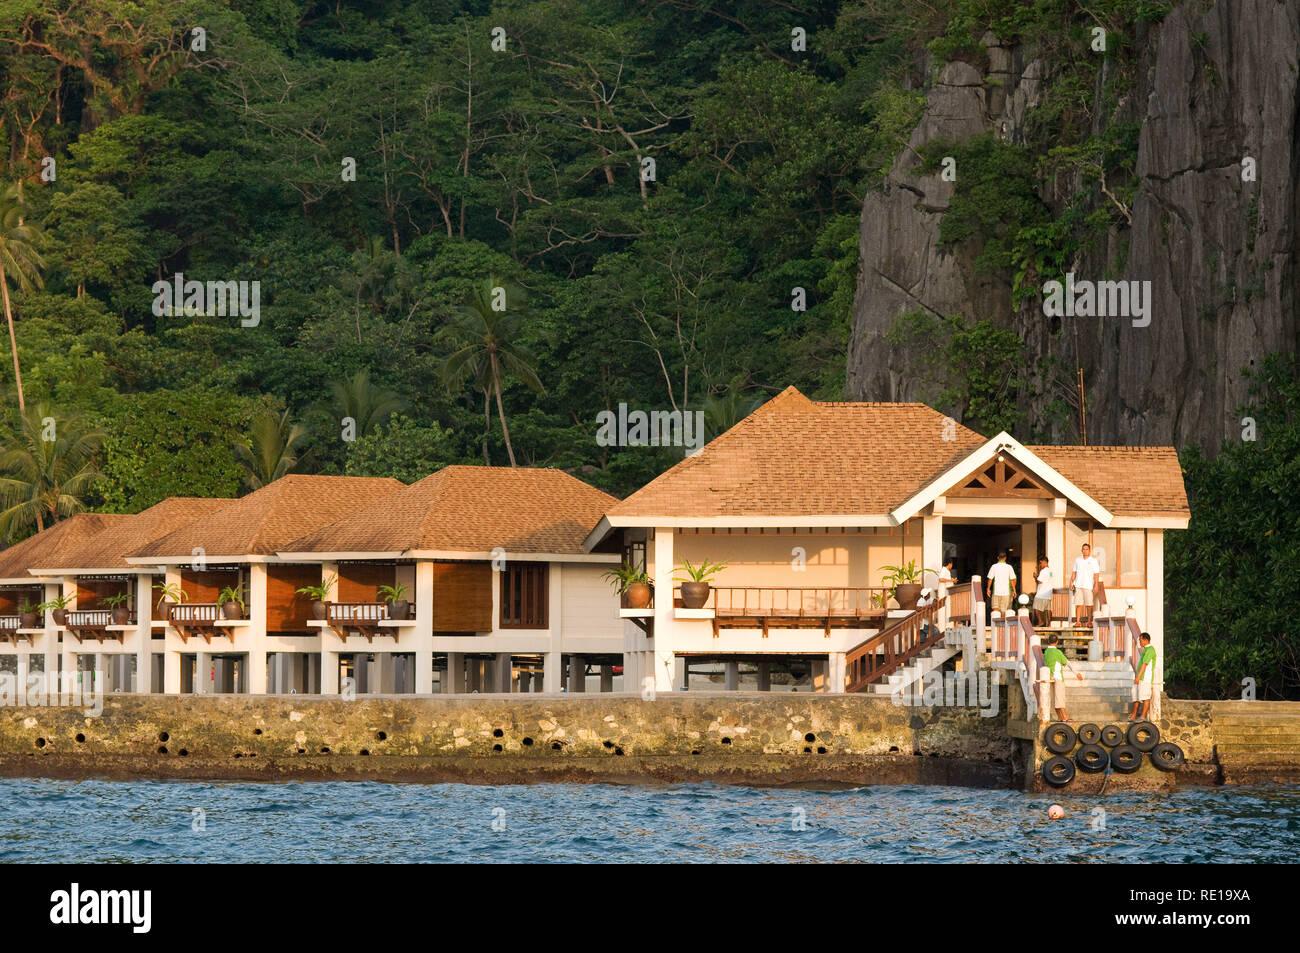 El Nido Resorts Miniloc Island Bacuit Archipelago Palawan